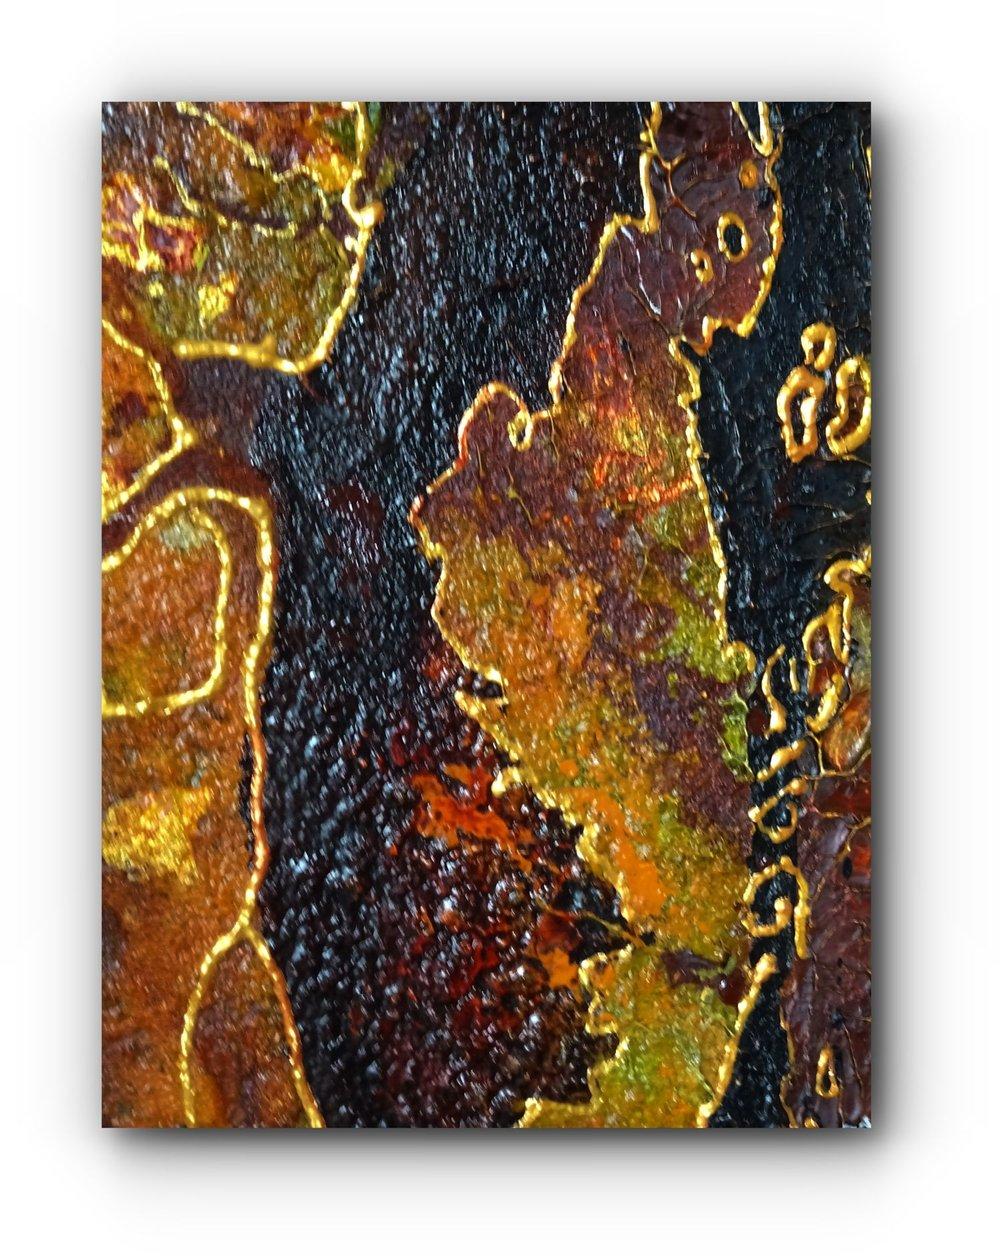 painting-detail-12-golden-sanctuary-artists-ingress-vortices.jpg